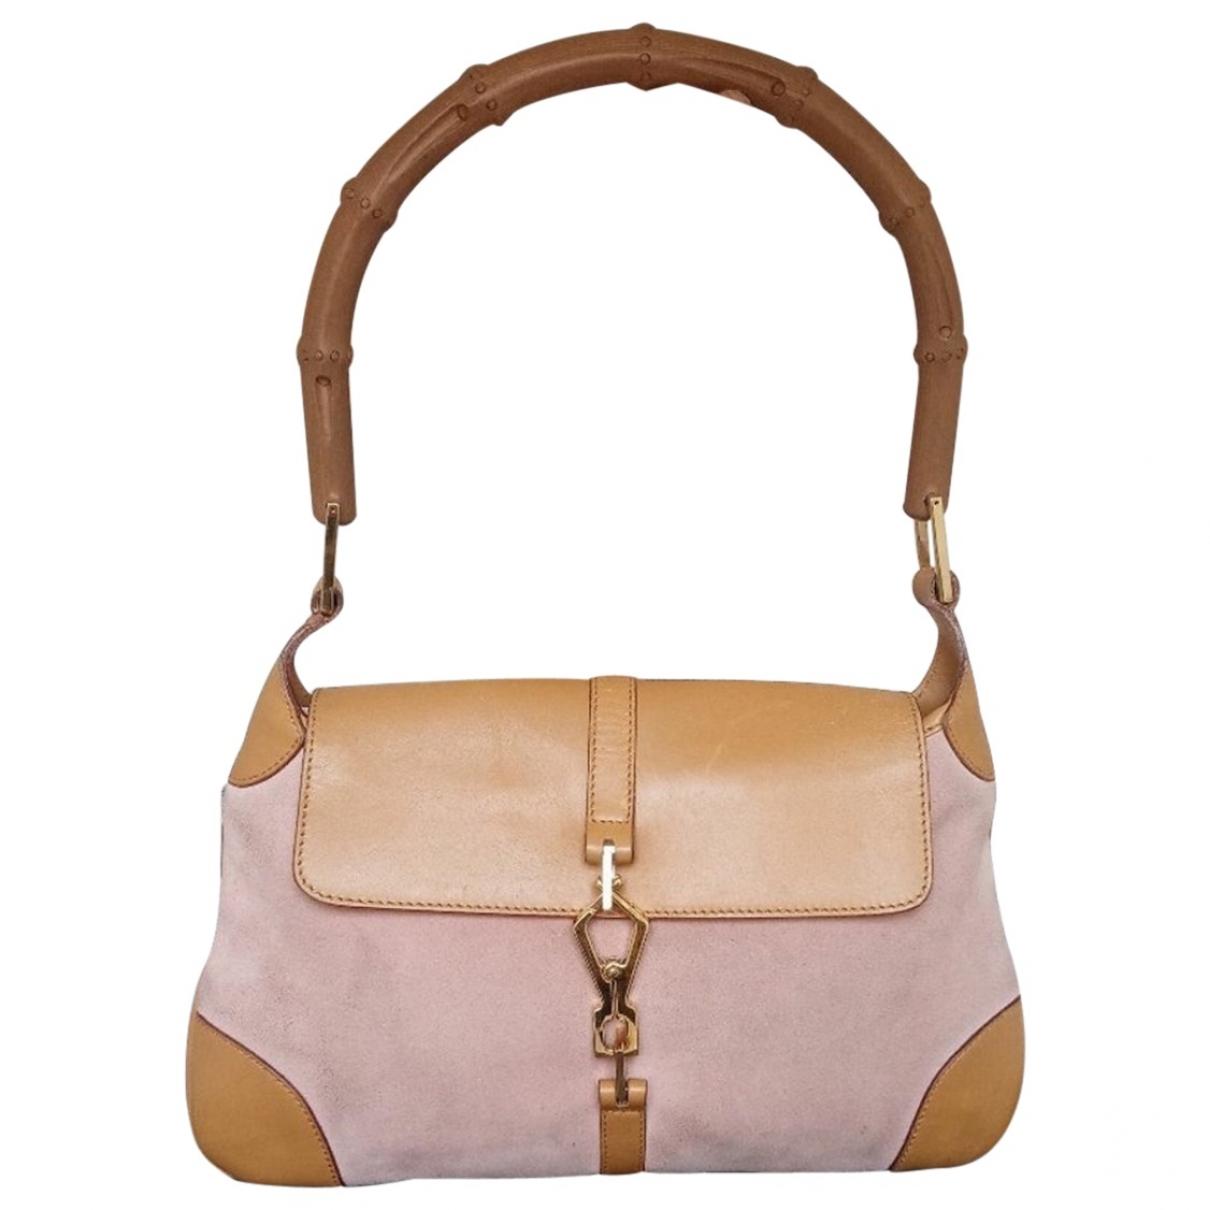 Gucci Bamboo Handtasche in  Rosa Veloursleder